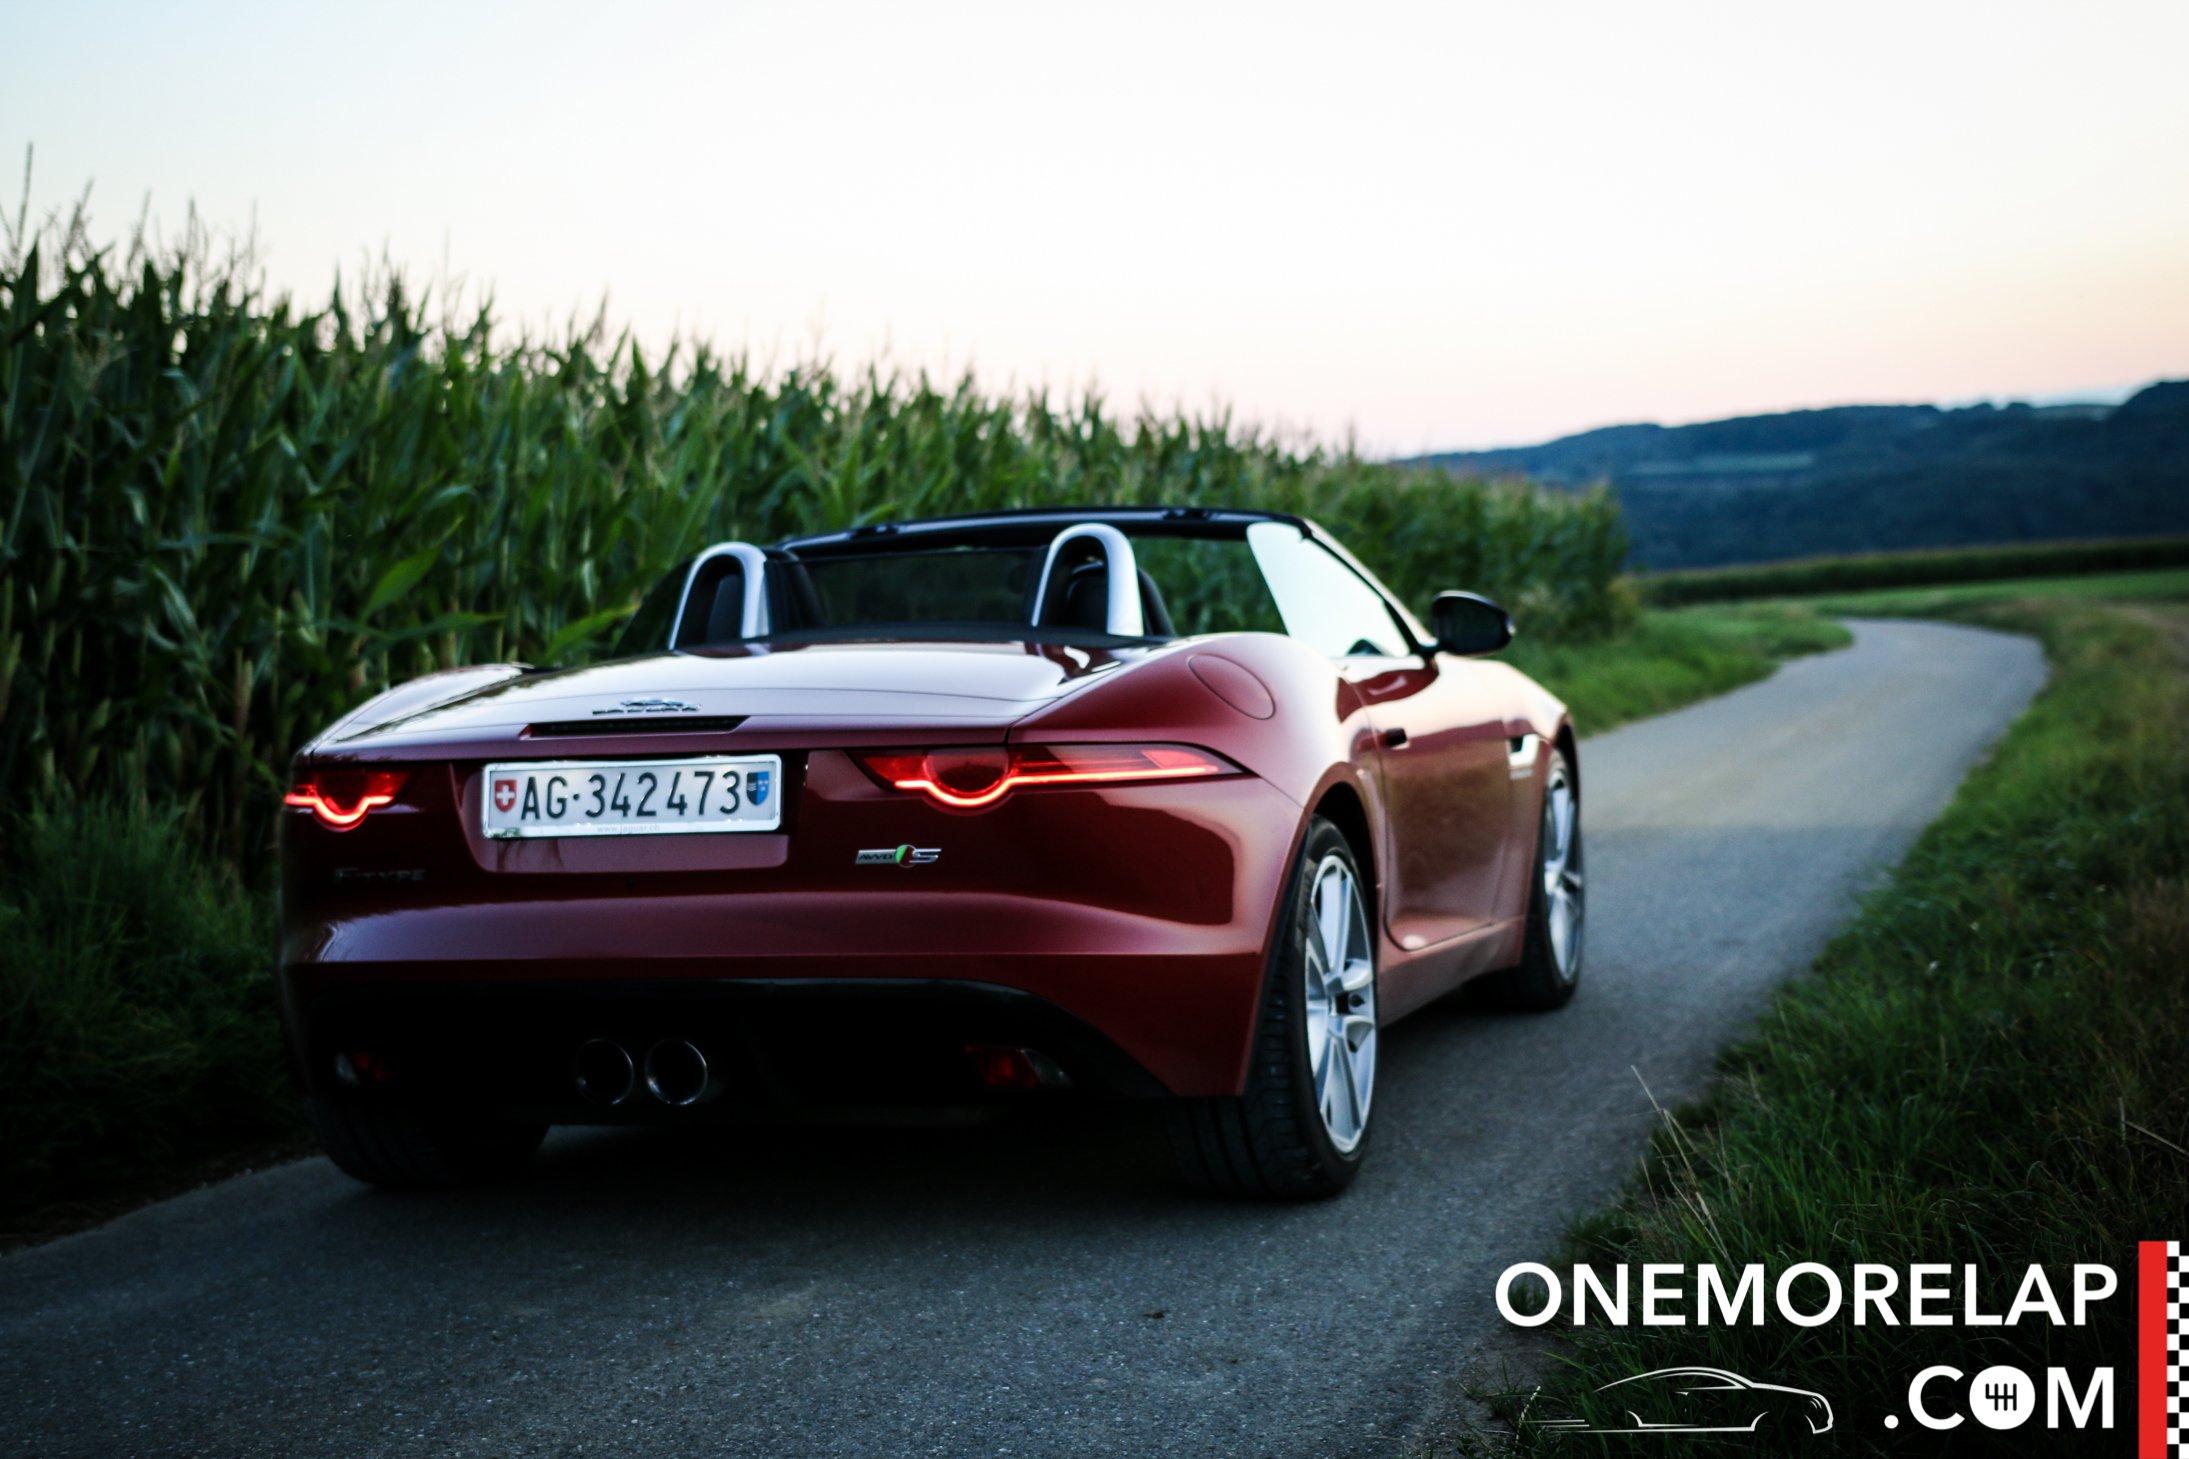 Jaguar F-Type S AWD Test